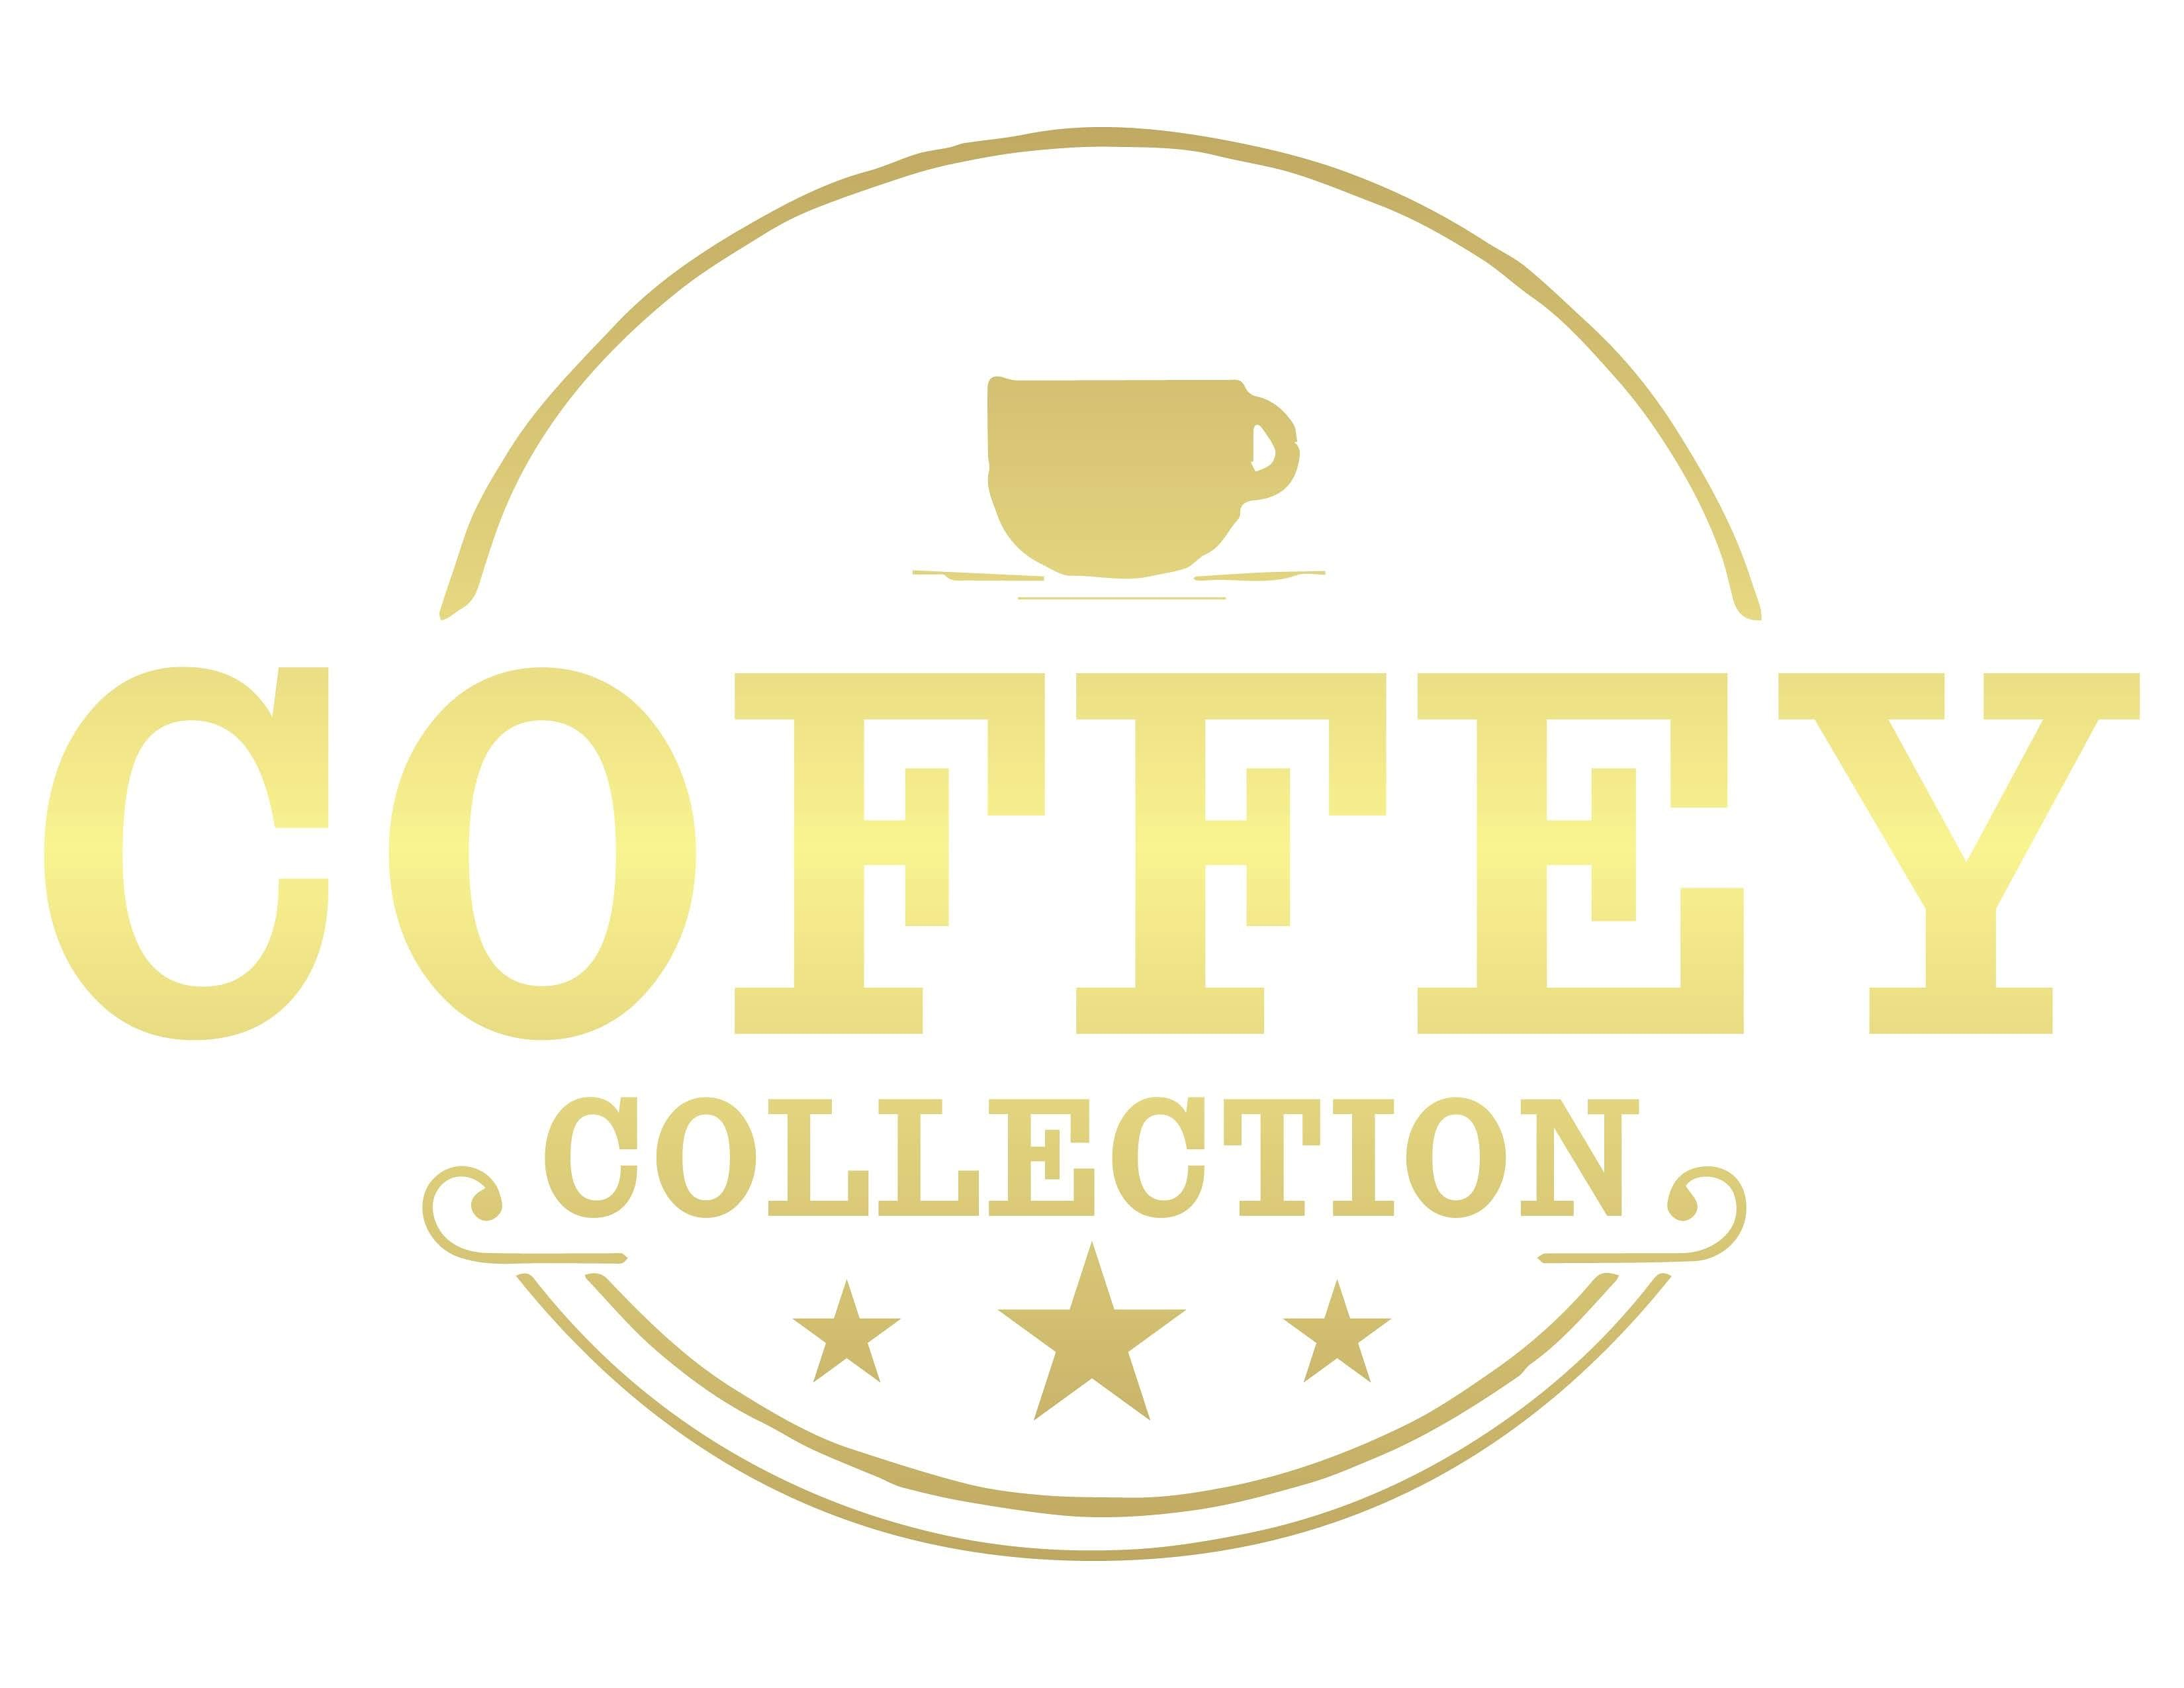 Coffey collection Tshirts